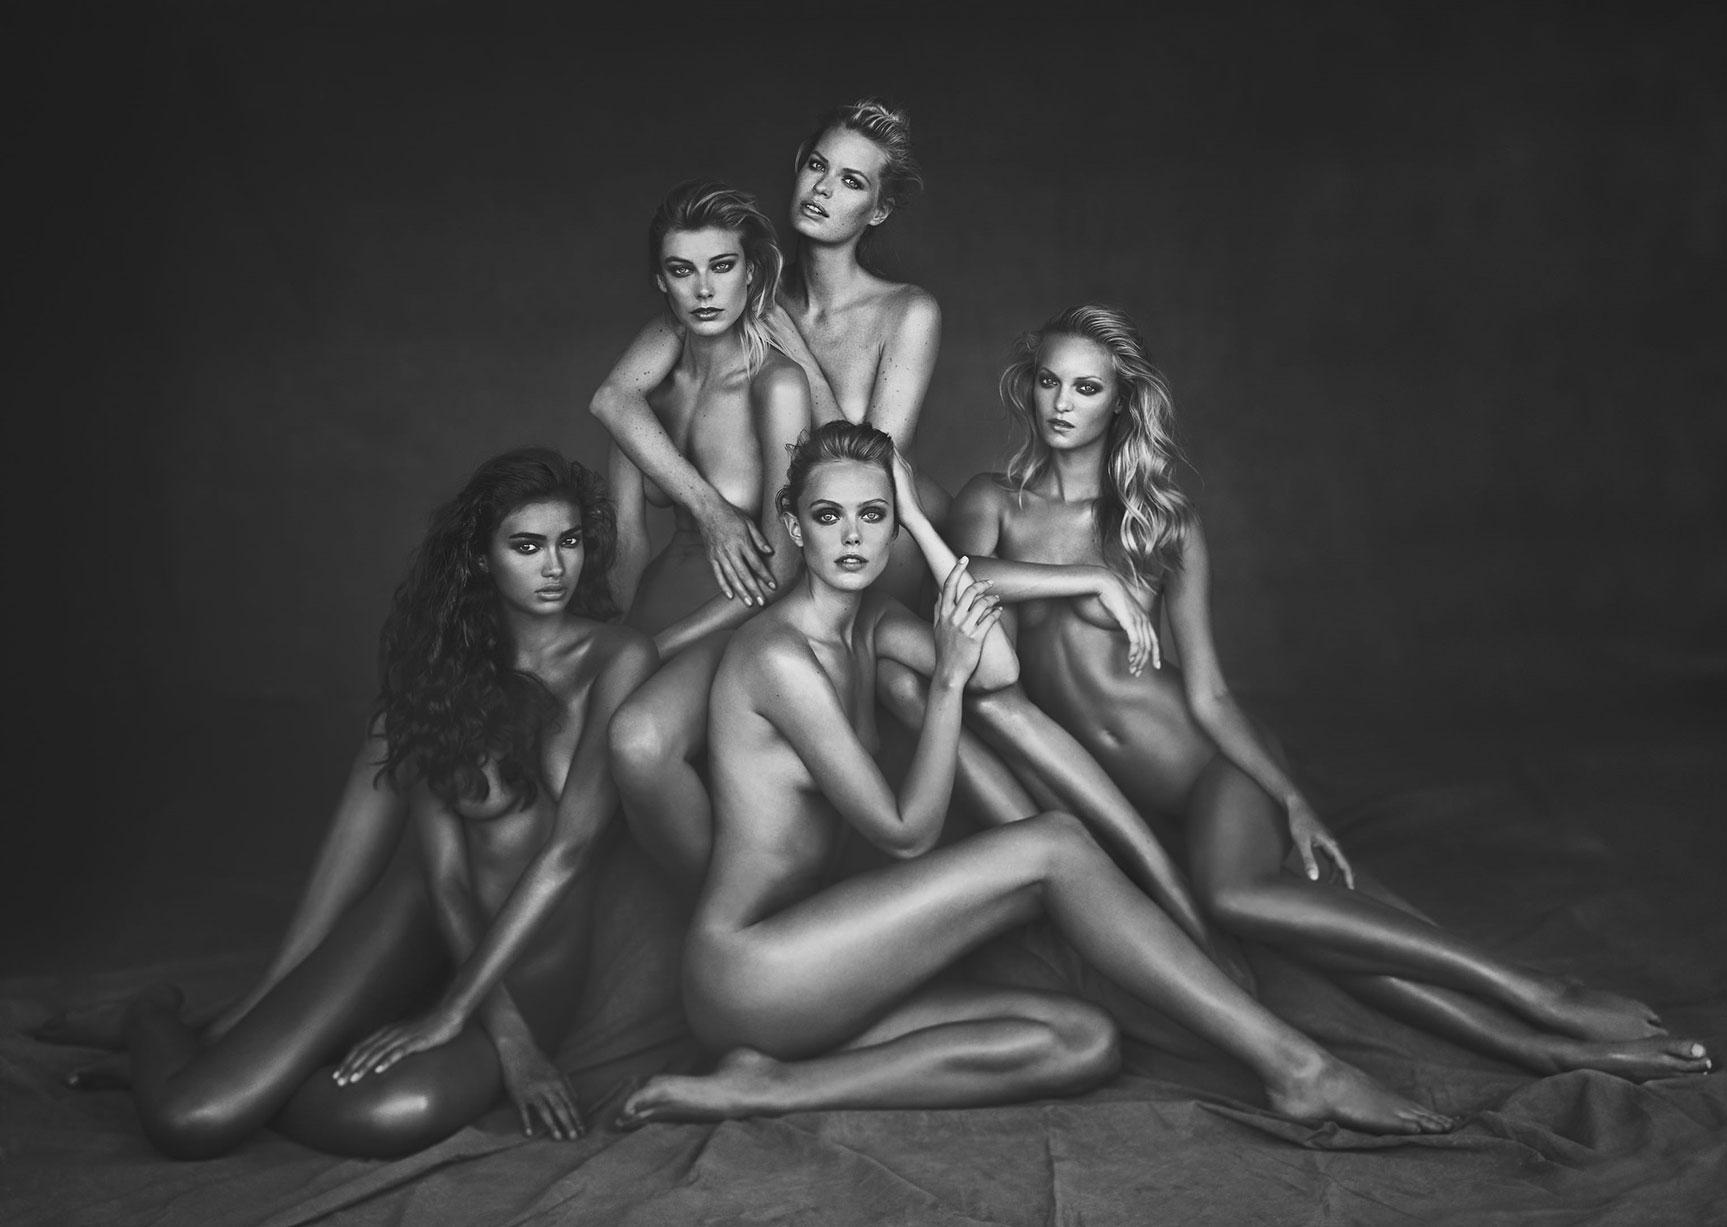 подборка фотографий сексуальных голых девушек - Kelly Gale, Frida Gustavsson, Caroline Winberg, Theres Alexandersson, Madelene de la Motte